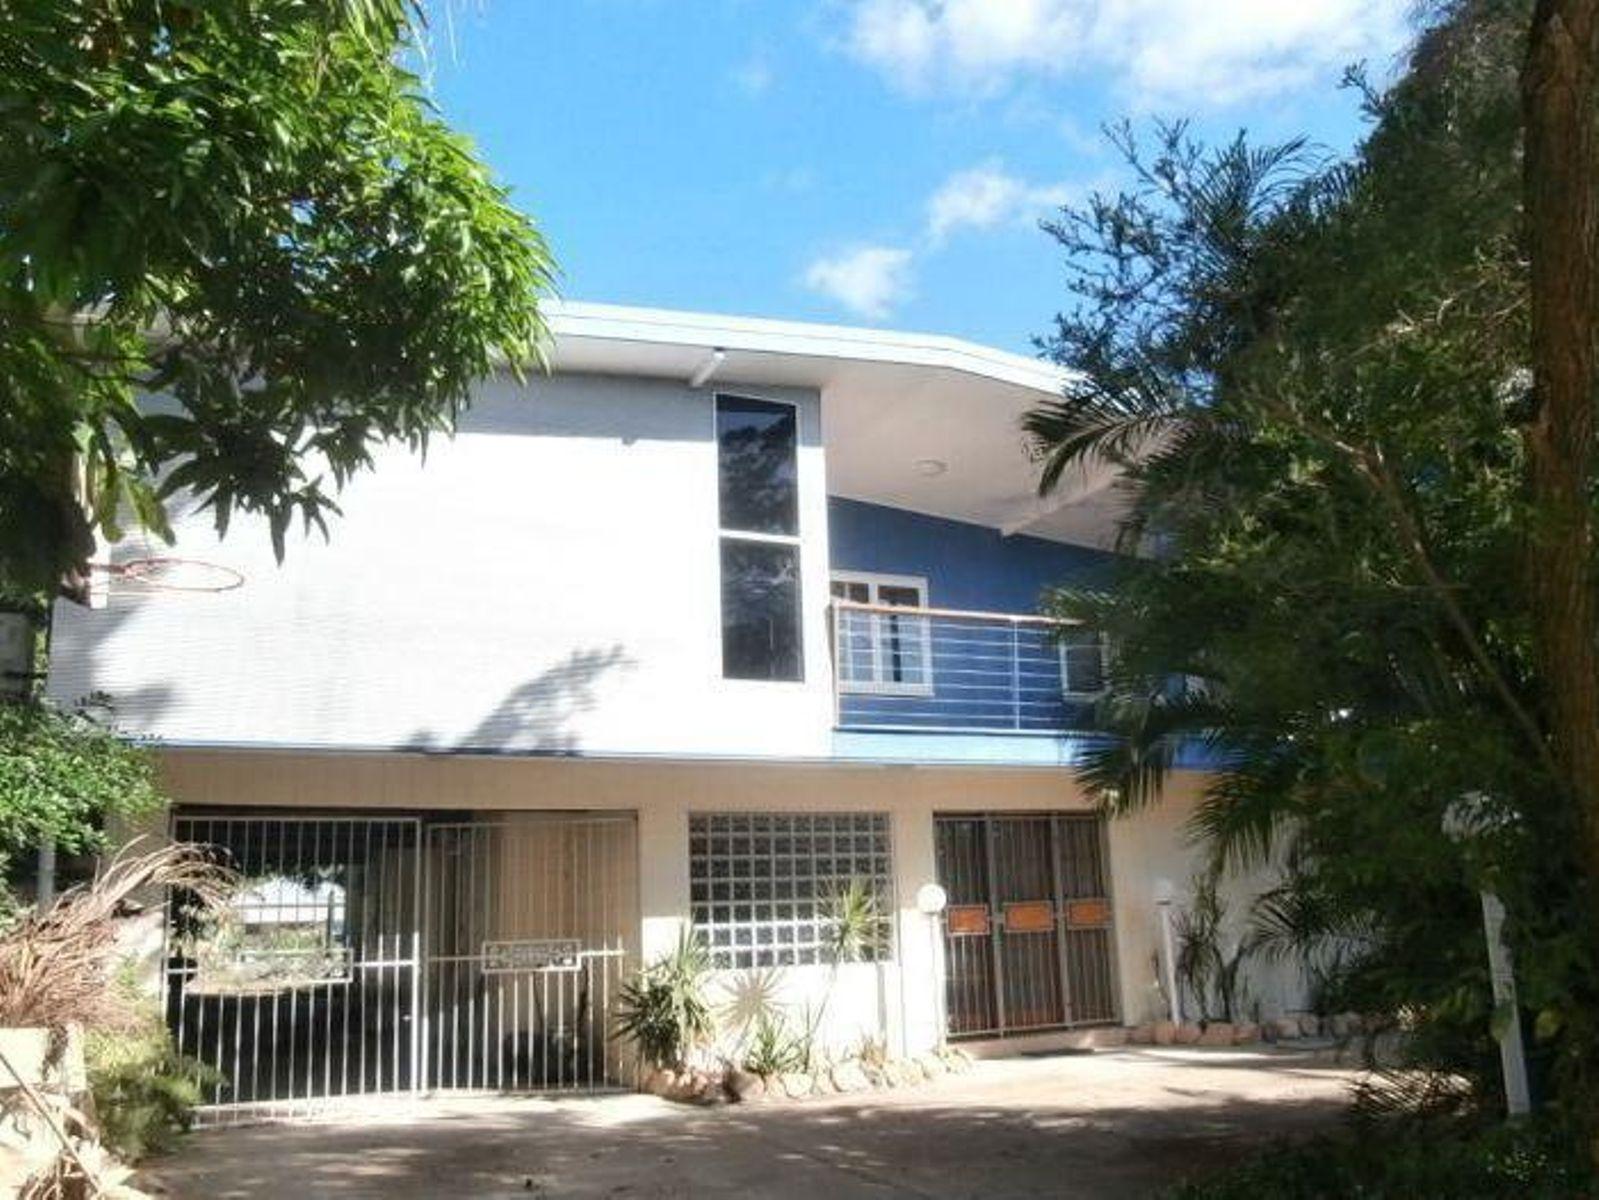 12 Patrick Street, Aitkenvale, QLD 4814